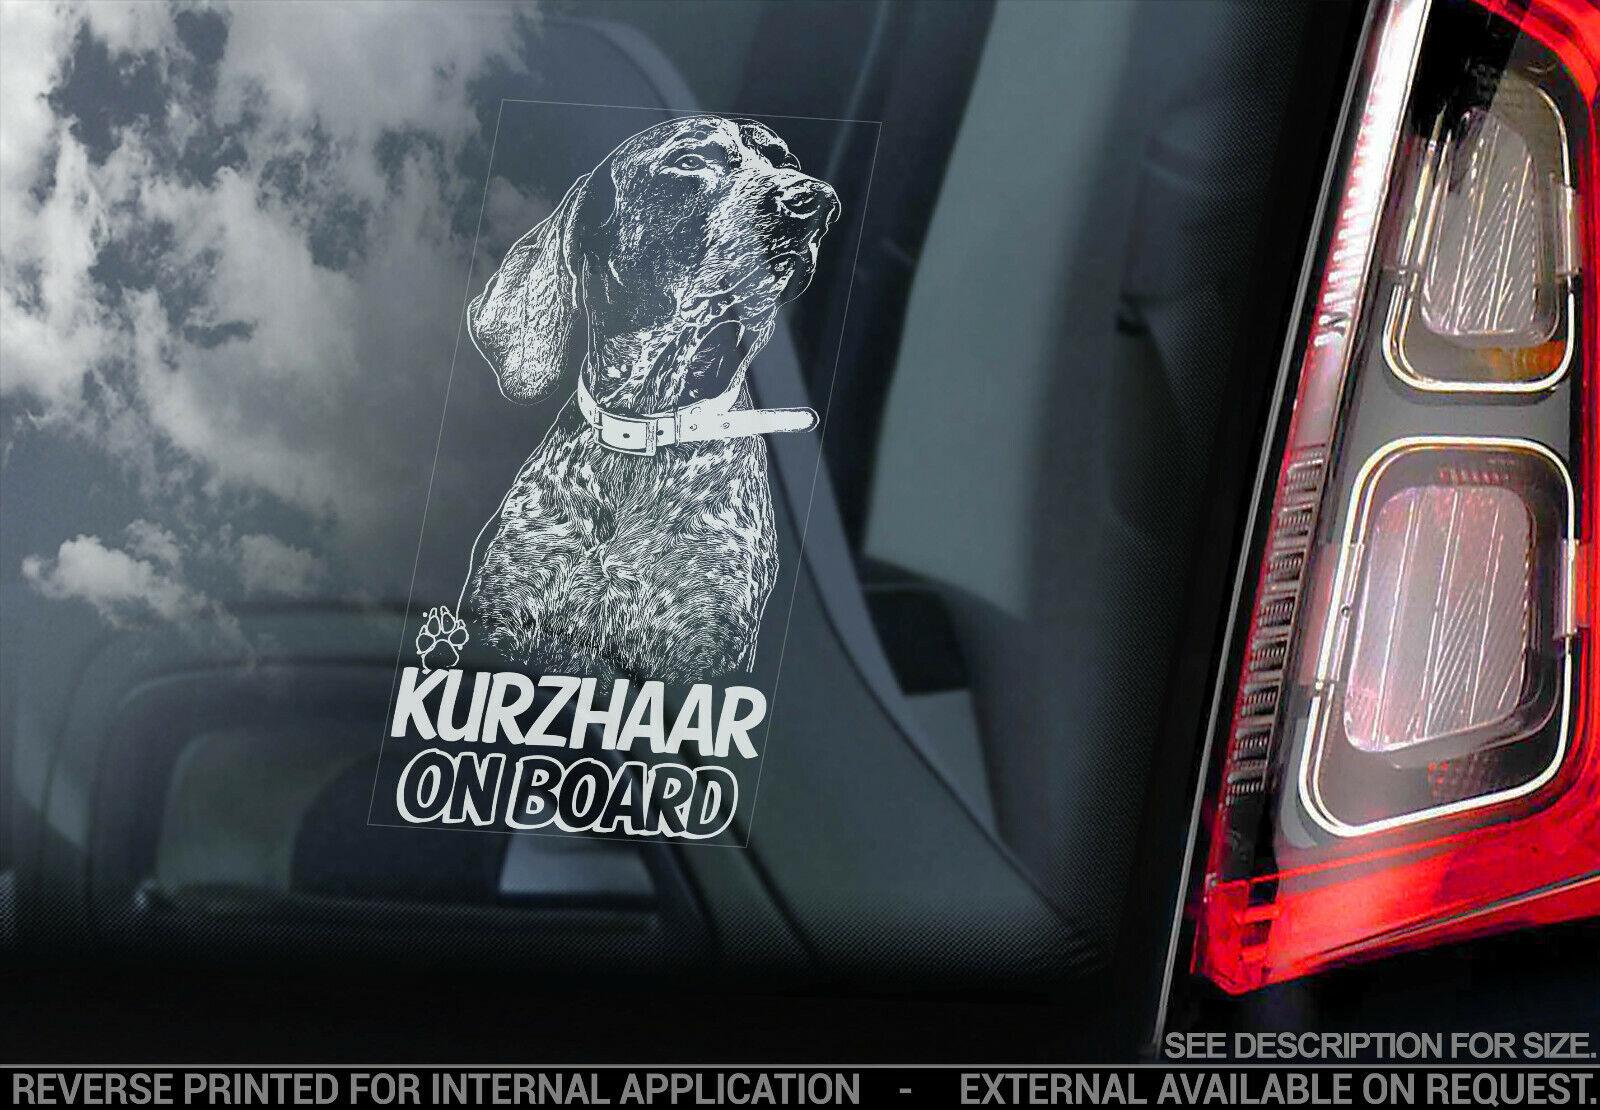 German Longhaired Pointer on Board Car Window Sticker Kurzhaar Dog Decal V03